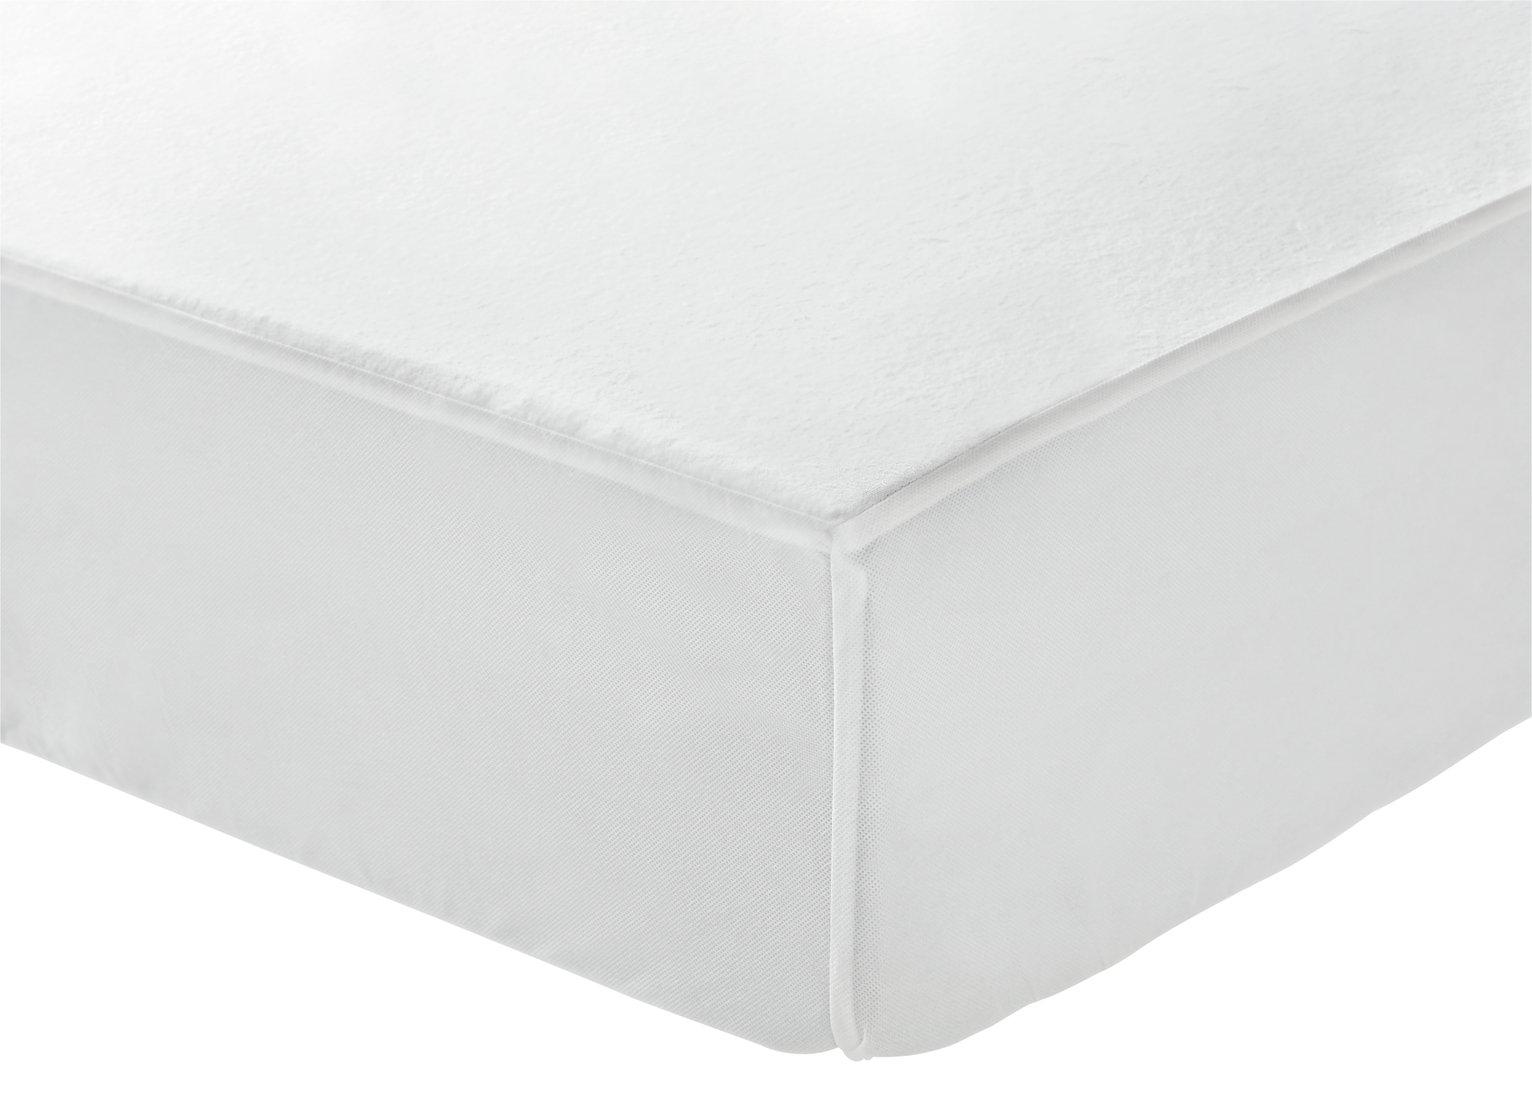 Argos Home Soft Cotton Waterproof Mattress Protector review